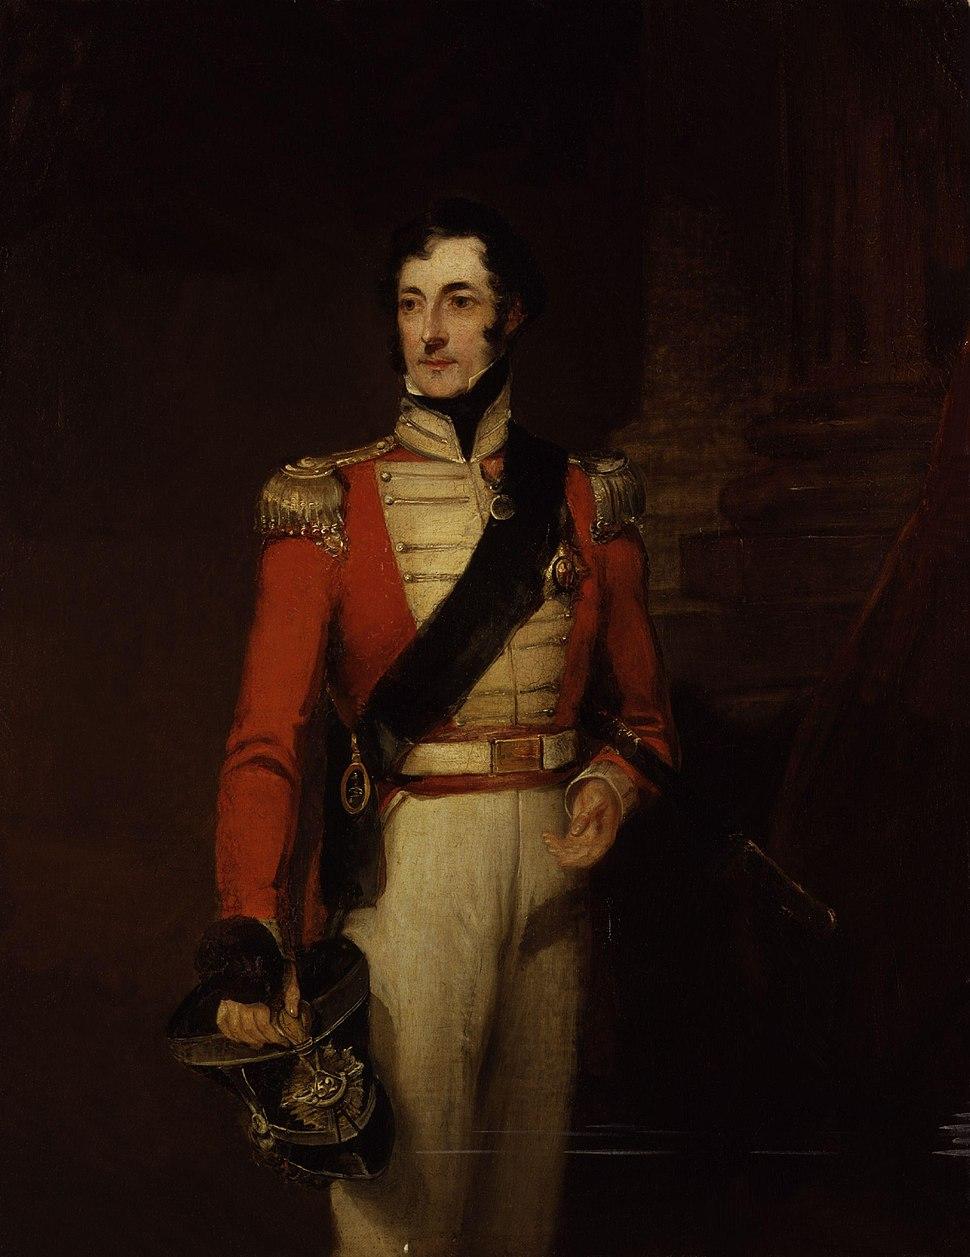 Charles Gordon-Lennox, 5th Duke of Richmond and Lennox by William Salter